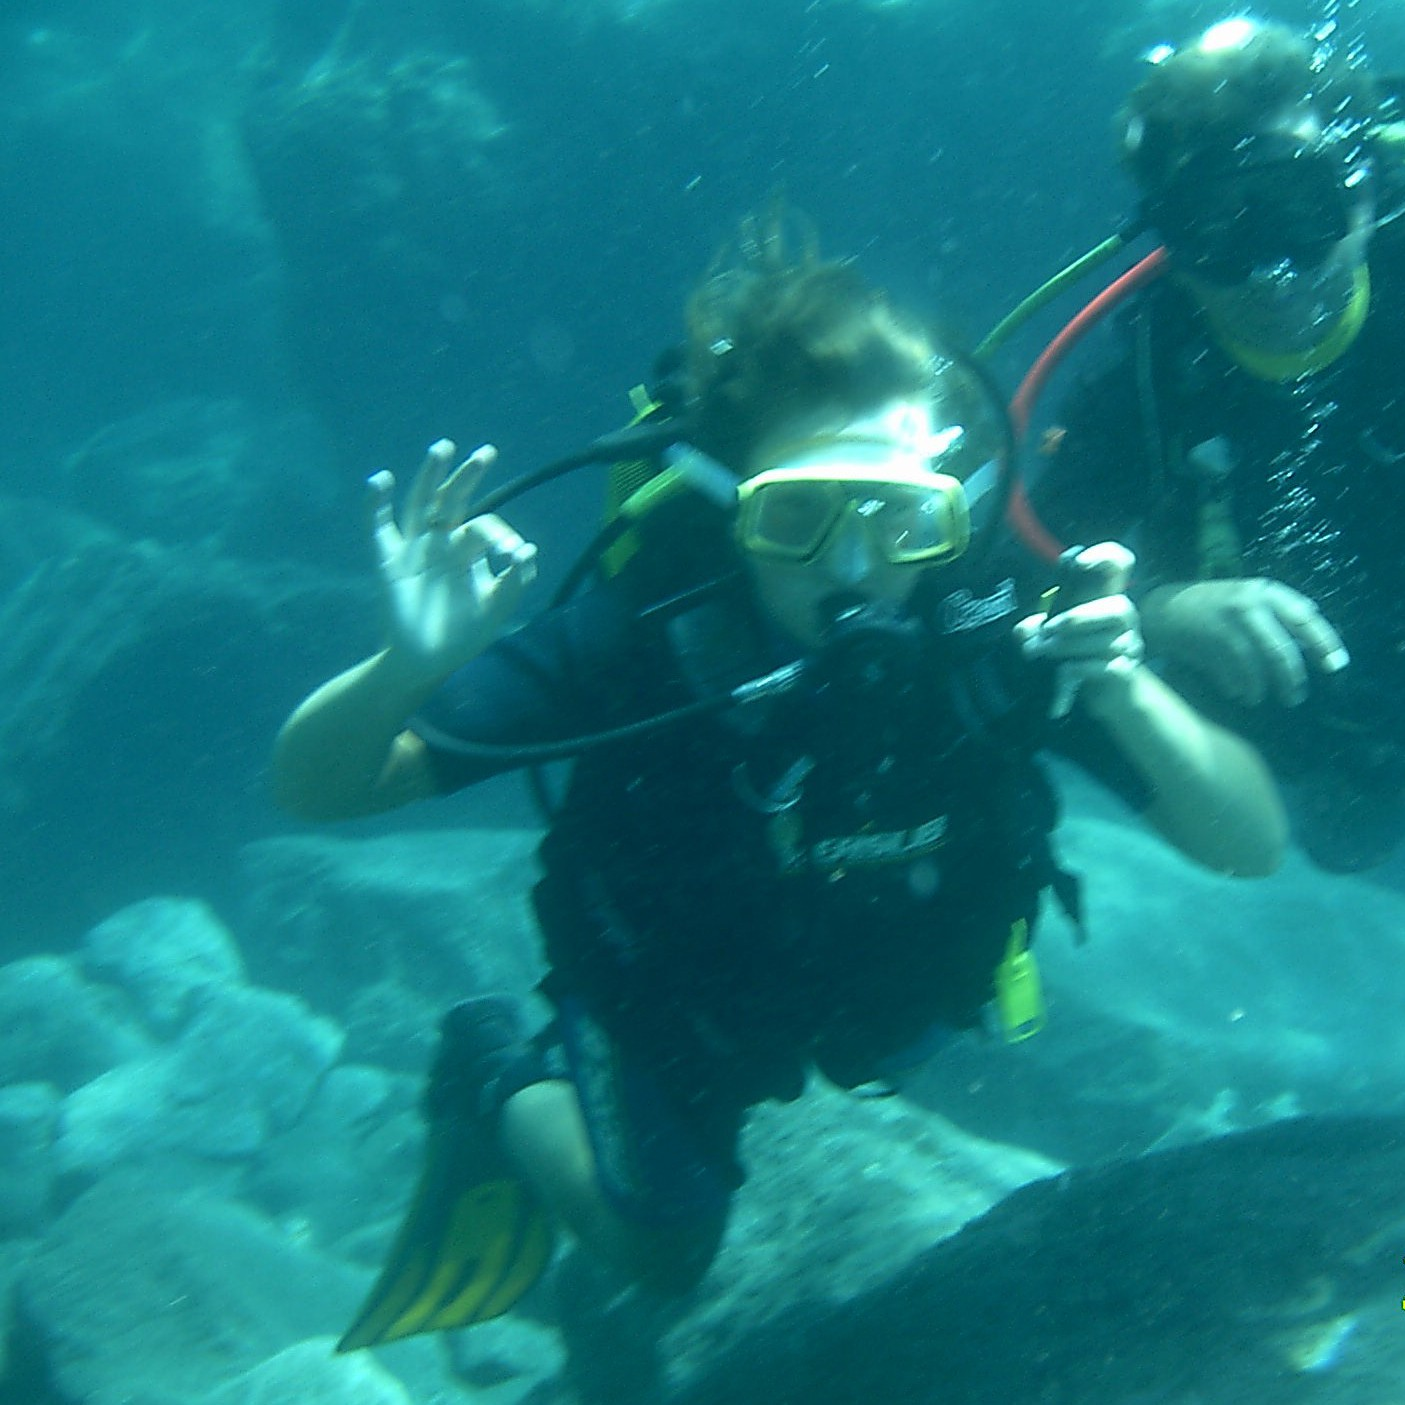 Deep in the ocean!